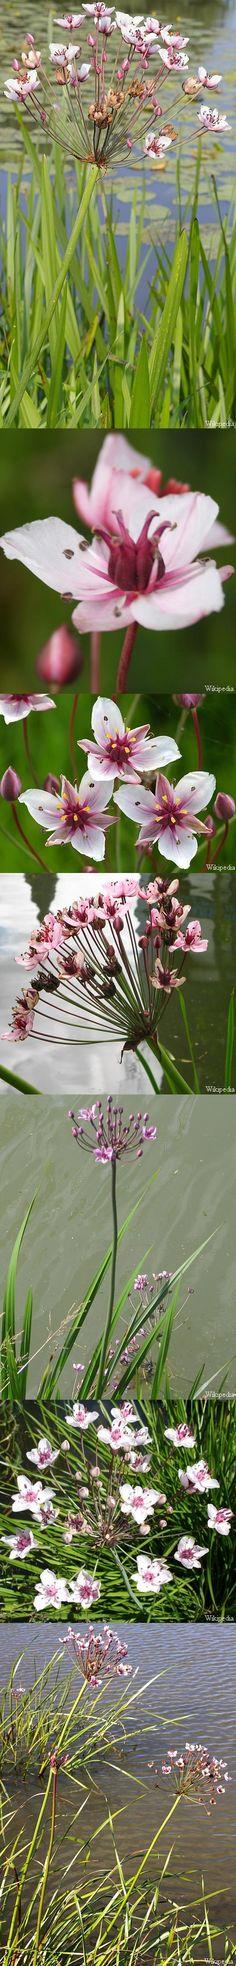 Zwanenbloem - Butomus umbellatus Live Aquarium Plants, Pond Plants, Planted Aquarium, Garden Cabins, Farm Gardens, Cabin Ideas, Flowers, Design, Plants